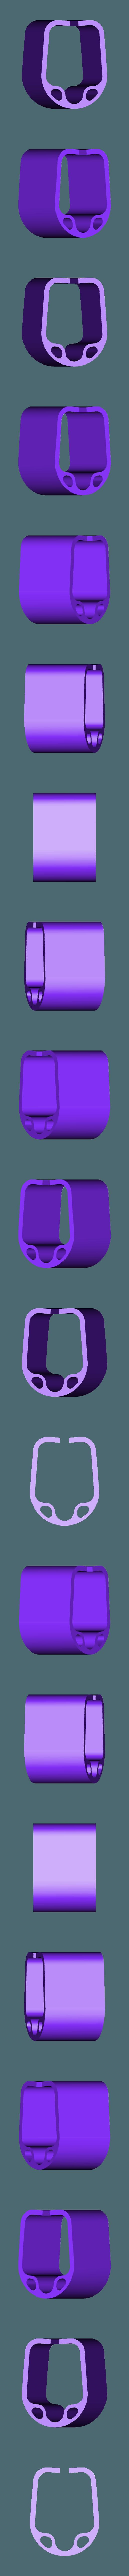 Bar_Clip_v1-1_Medium.STL Télécharger fichier STL gratuit Clips de fraisage RigidBot • Plan imprimable en 3D, WalterHsiao